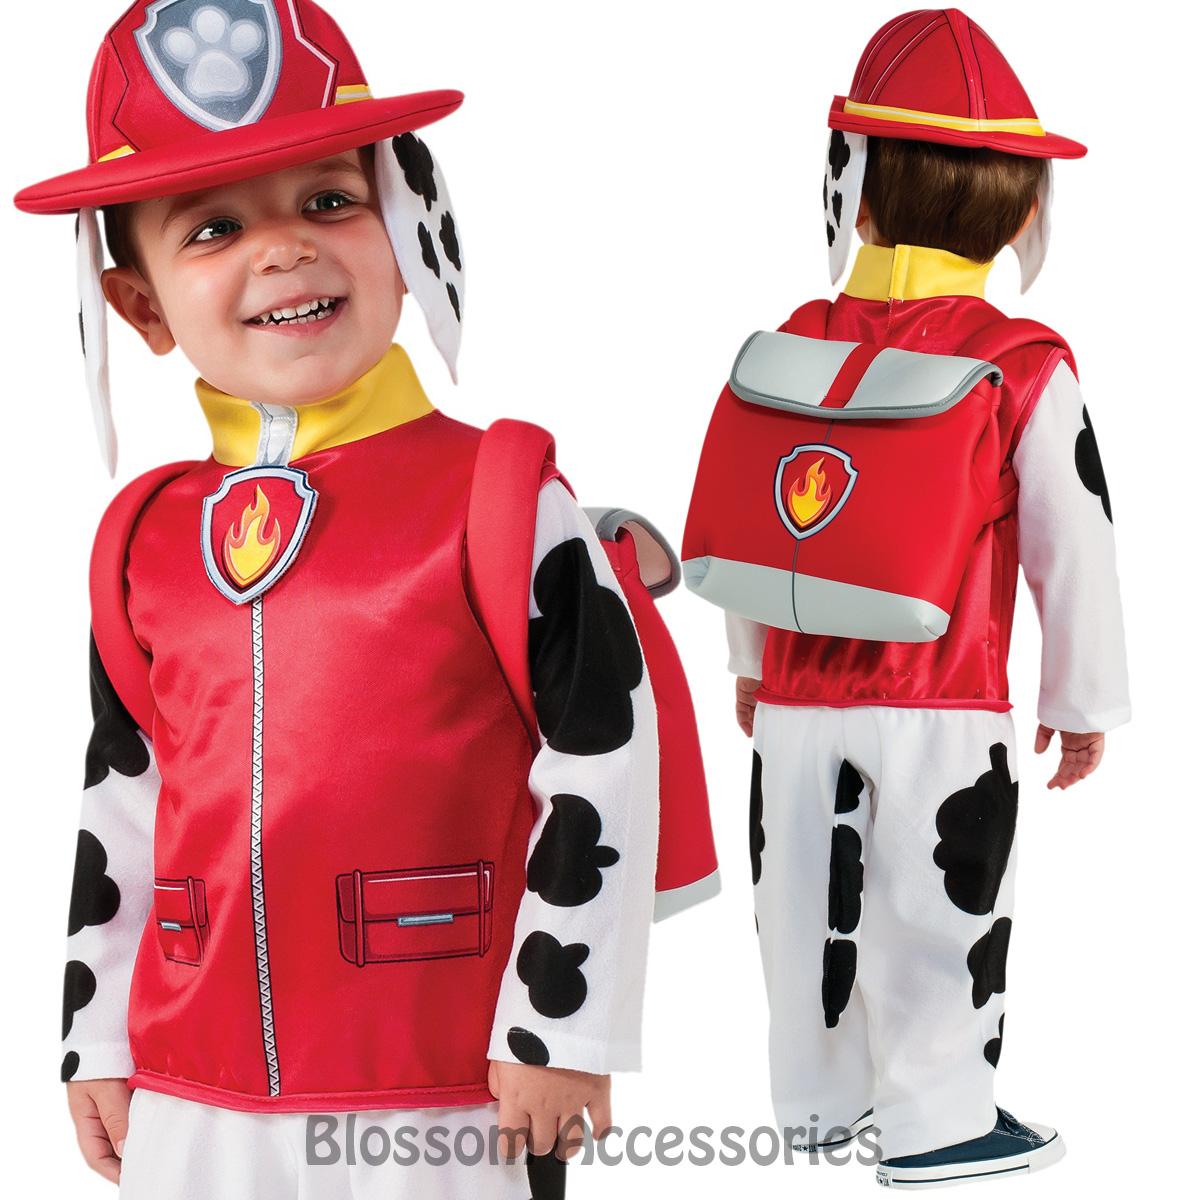 Ck789 Paw Patrol Boys Marshall Cartoon Fireman Fancy Dress Costume